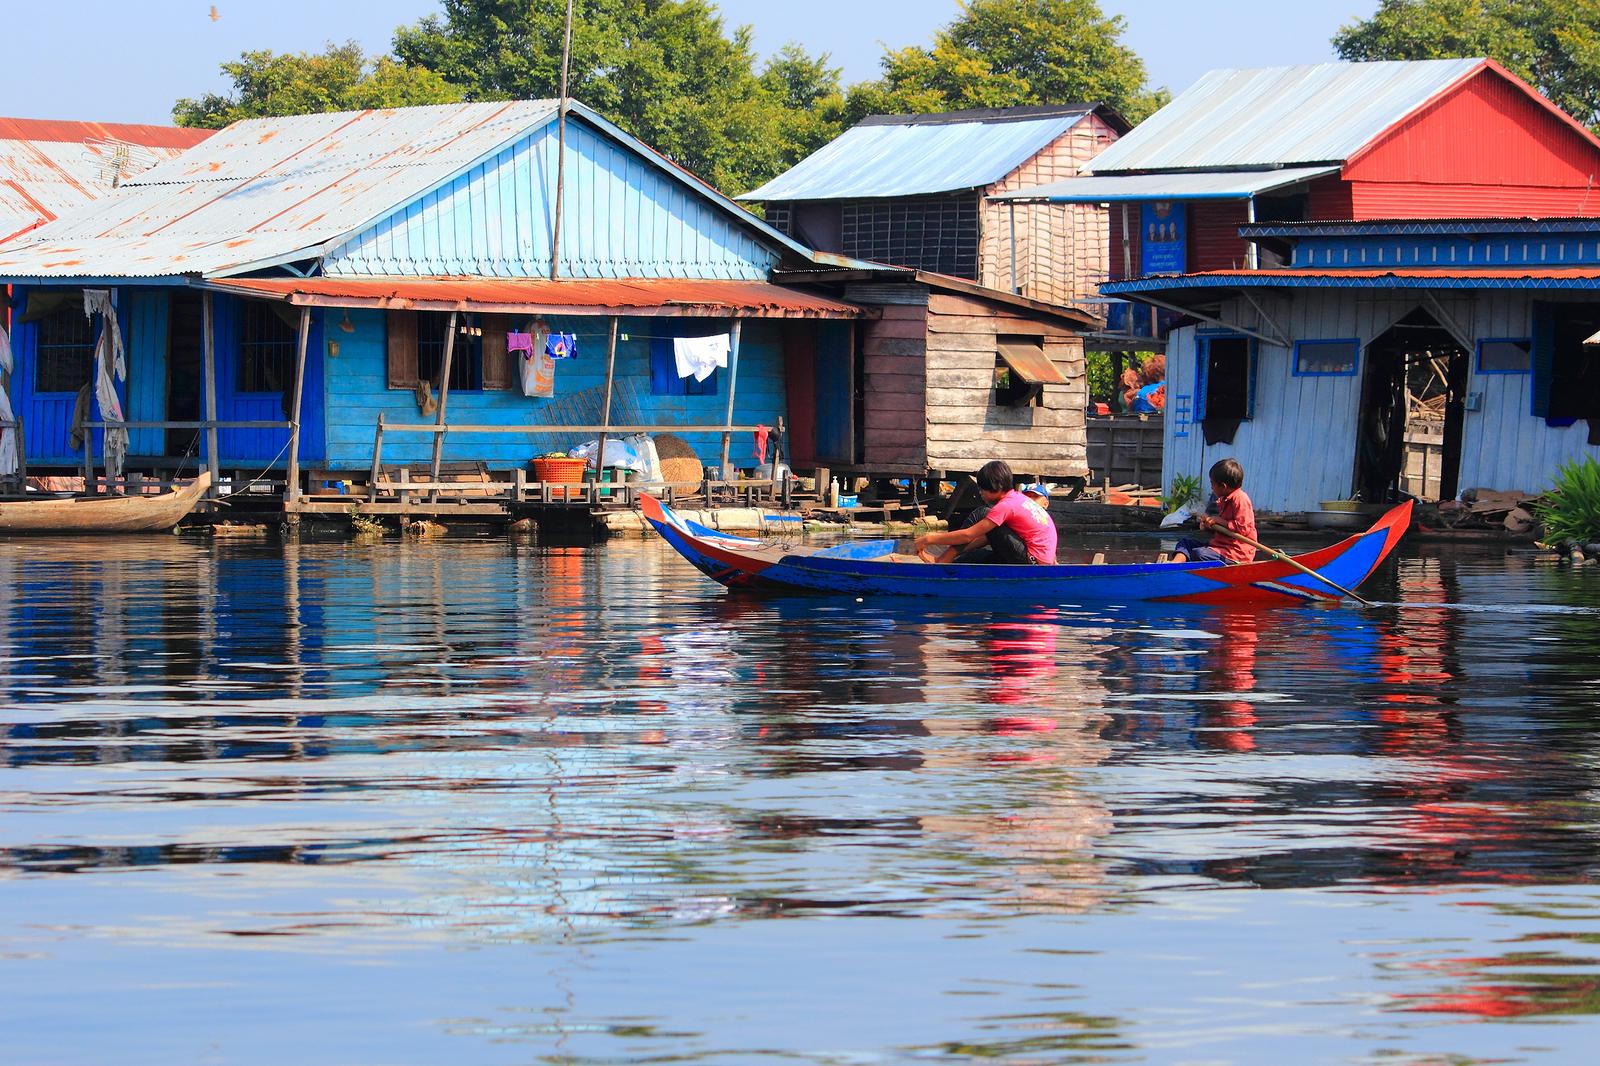 Tonle Sap lake Cambodia Ehabla Trave